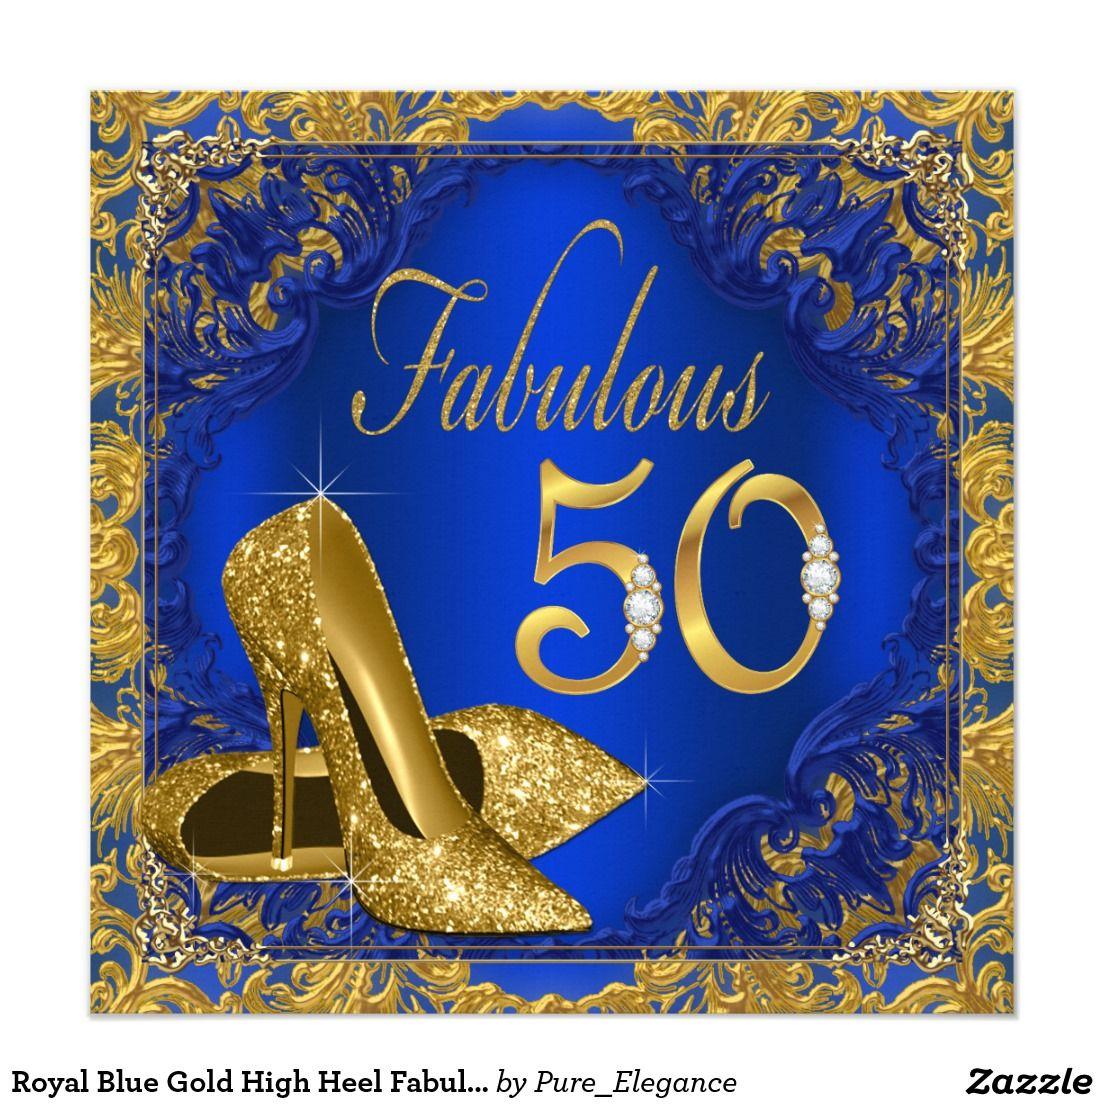 50 And Fabulous Meme: Royal Blue Gold High Heel Fabulous 50th Birthday 5.25x5.25